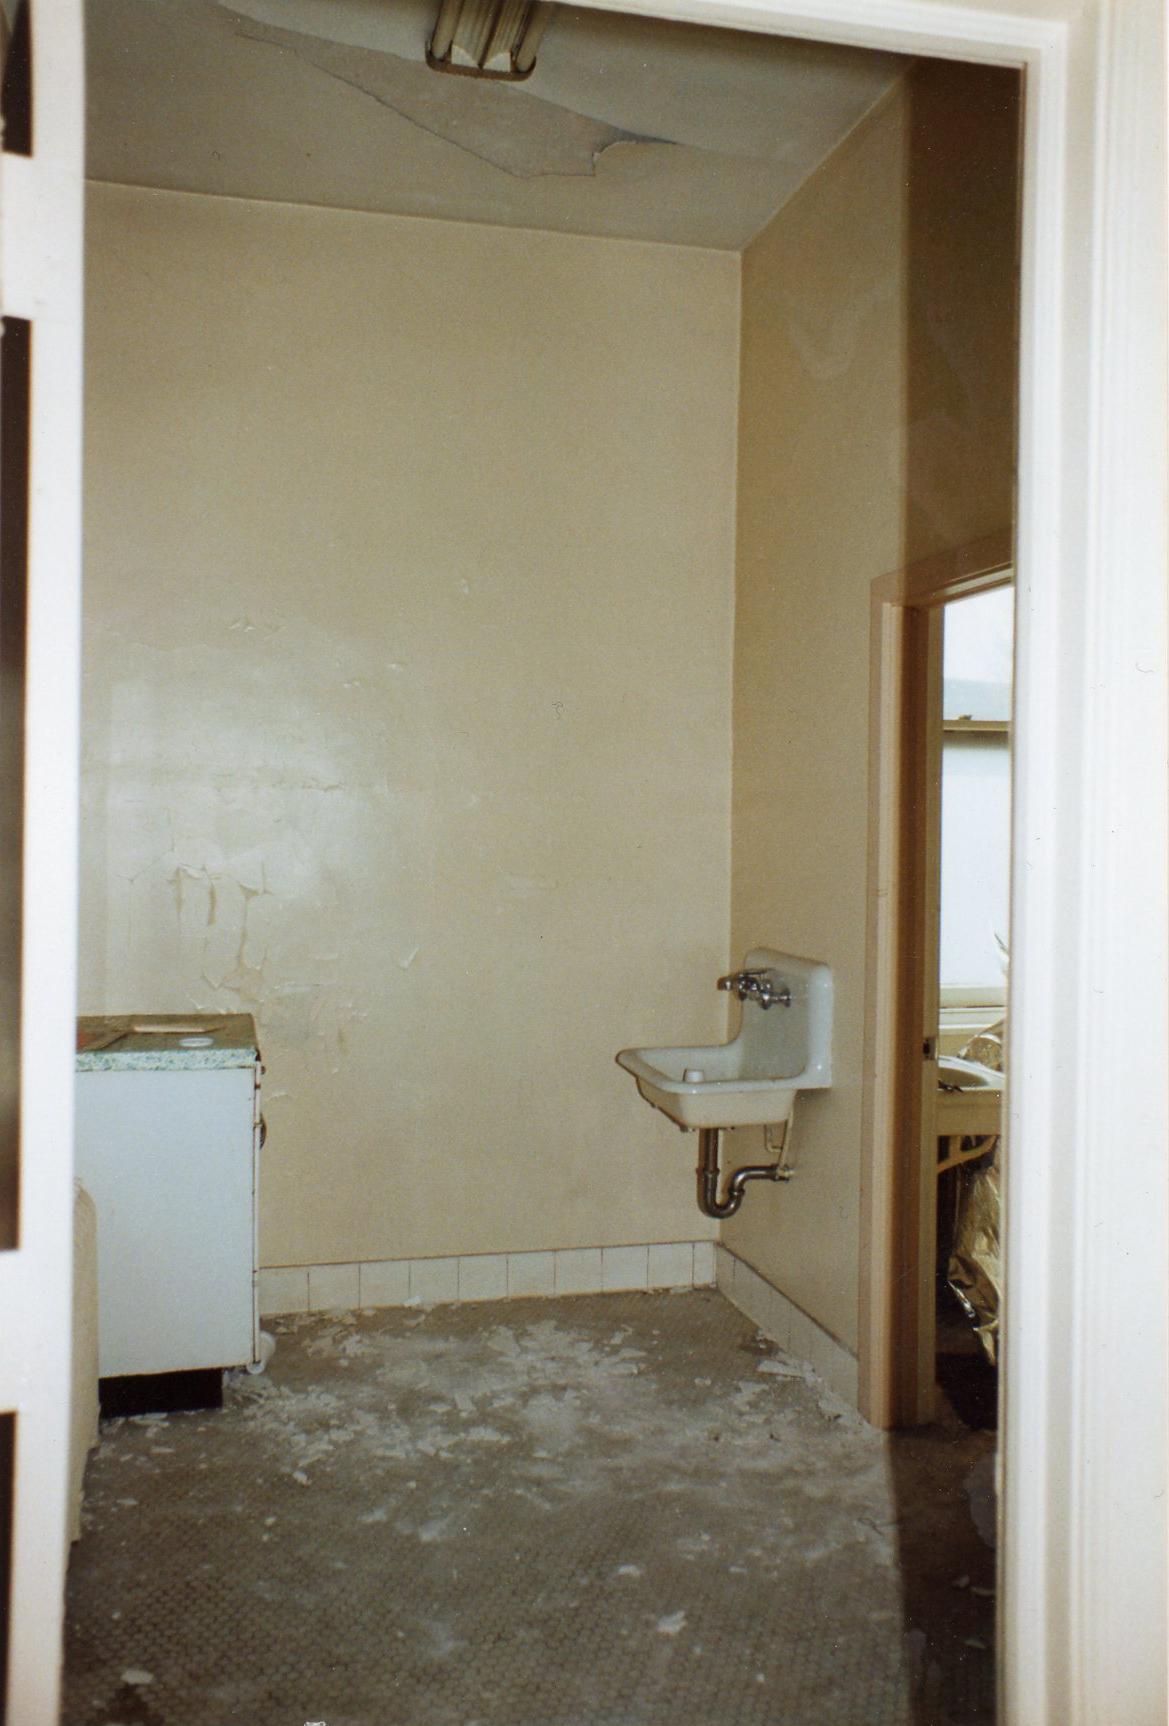 2ndfloor bath B4.jpg